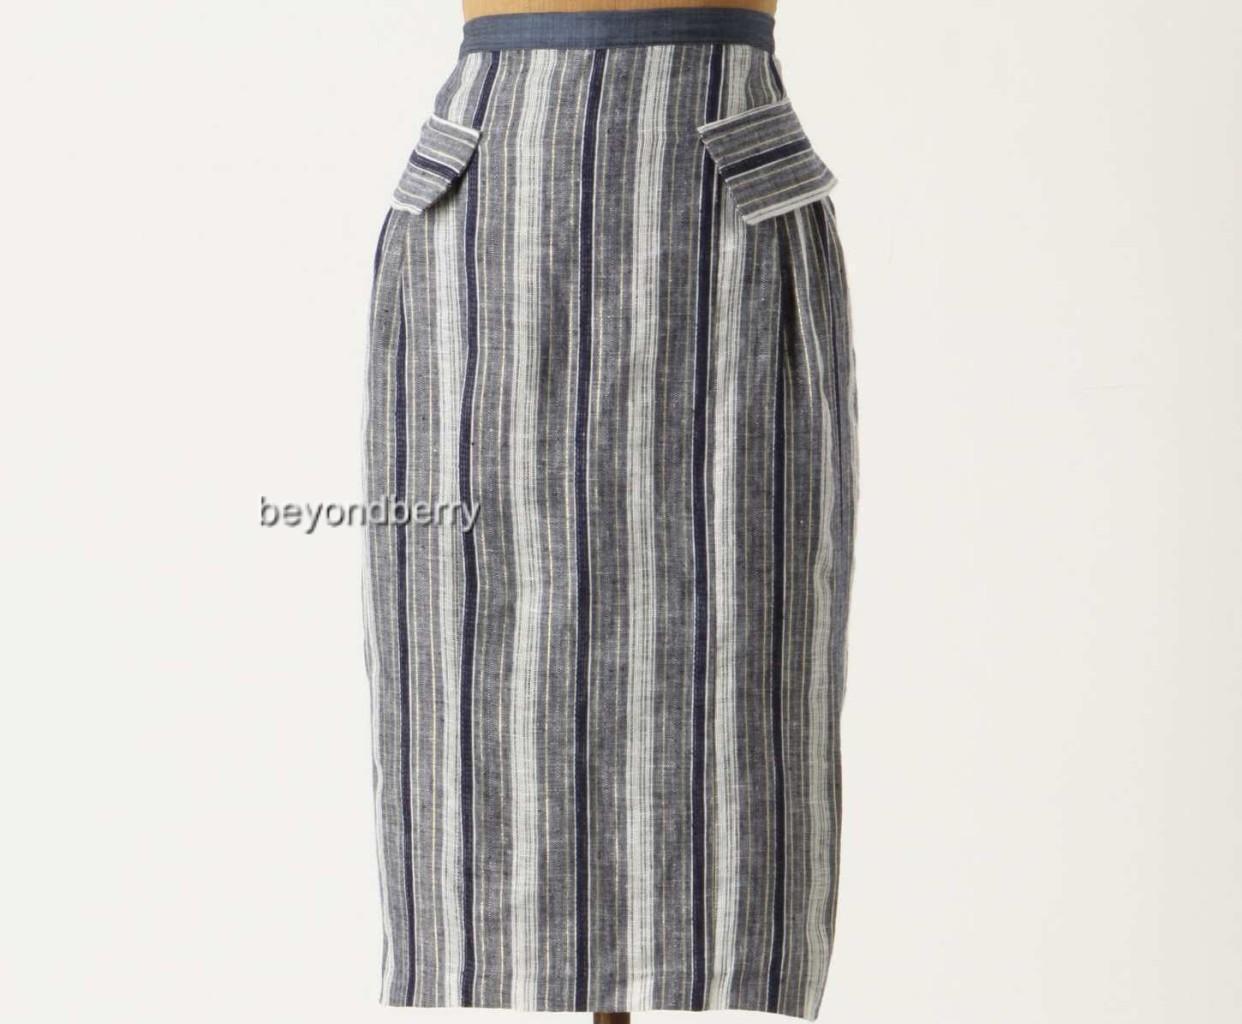 NEW Anthropologie Ruse Skirt by Eva Franco  Size 2